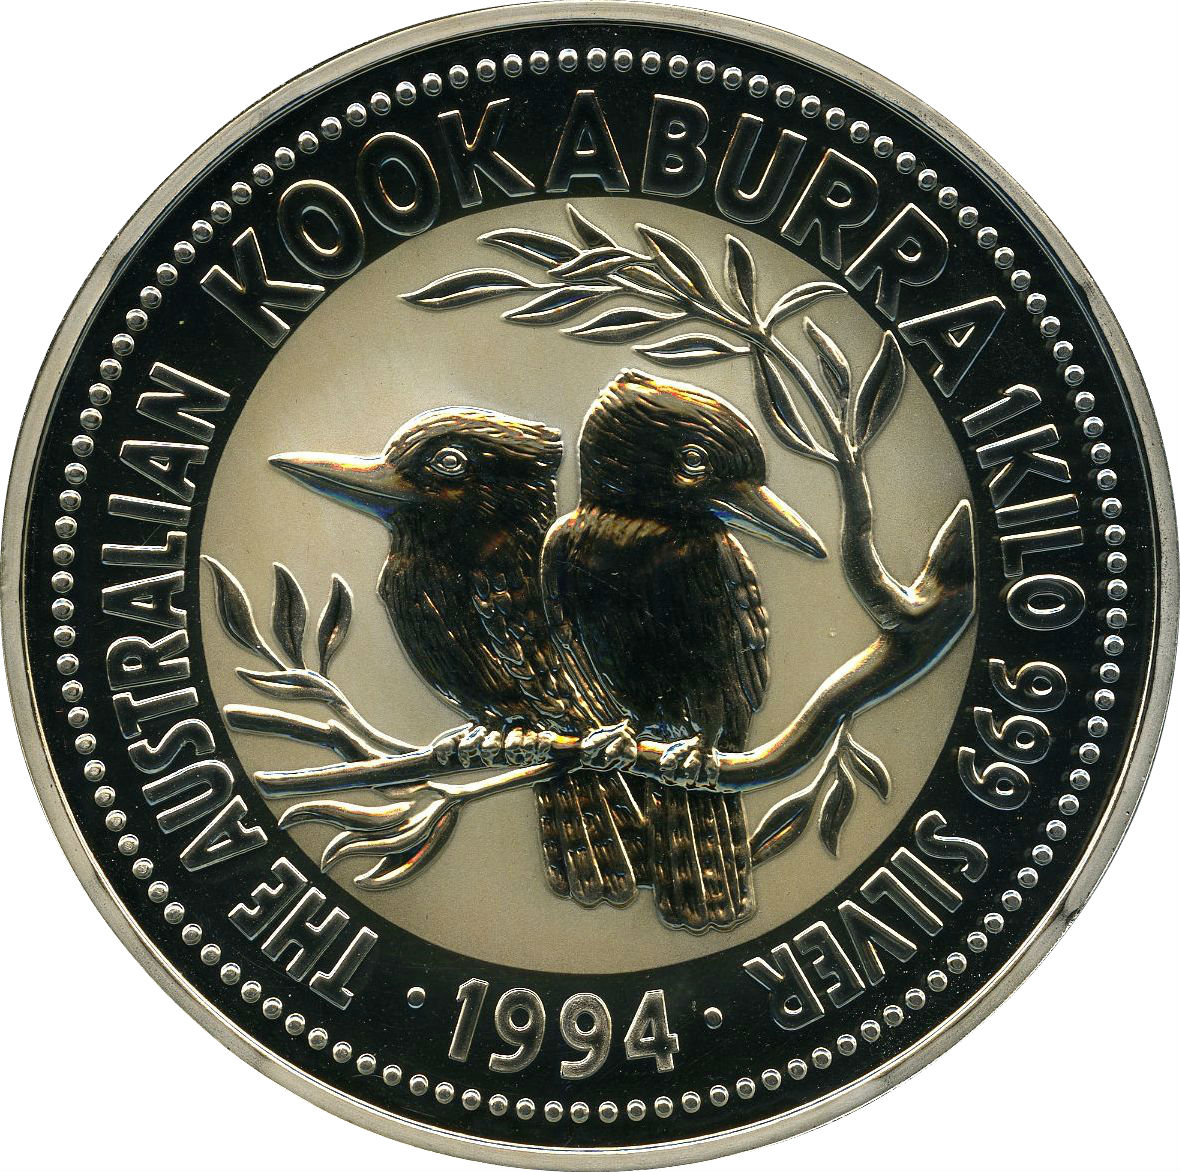 30 Dollars Elizabeth Ii Australian Kookaburra